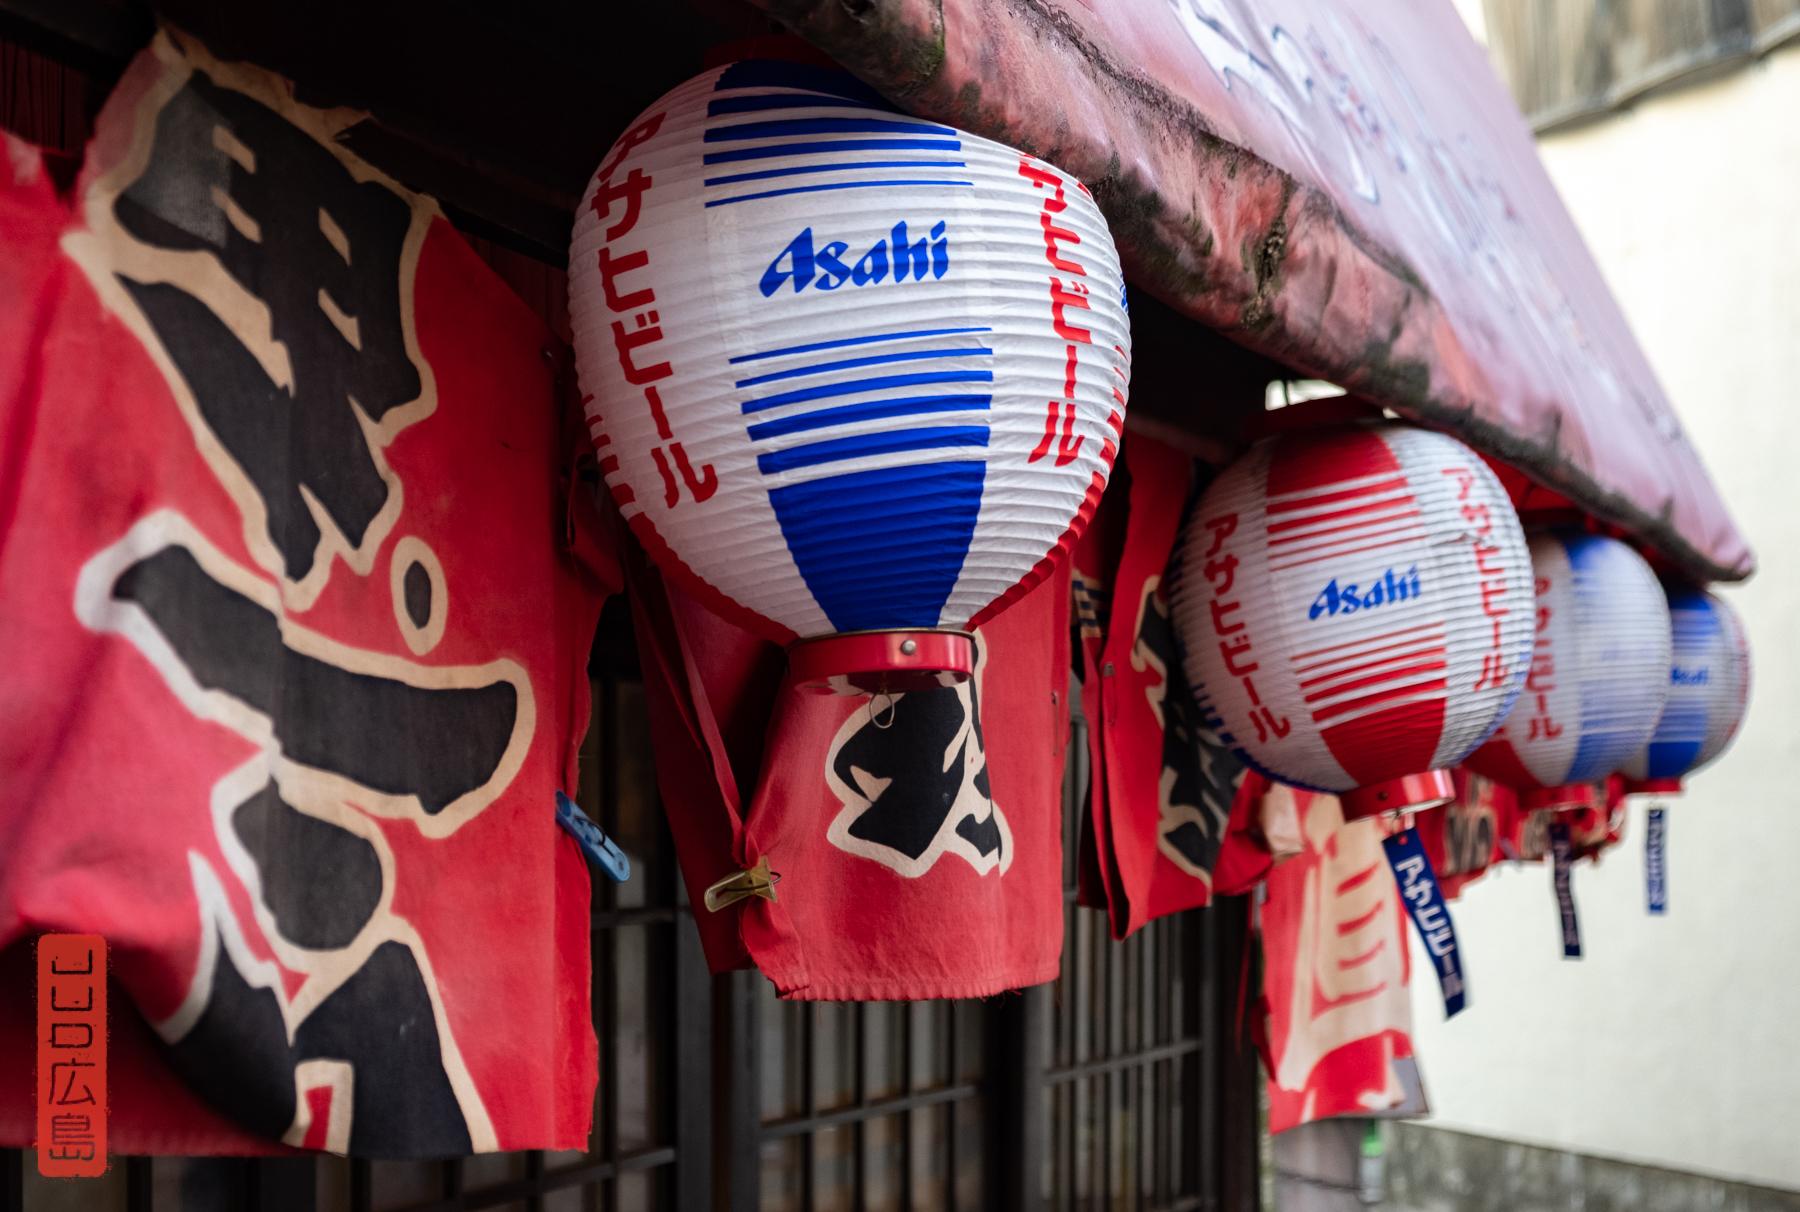 Hiroshima Hiratsuka lanternes et vieille devanture de resto